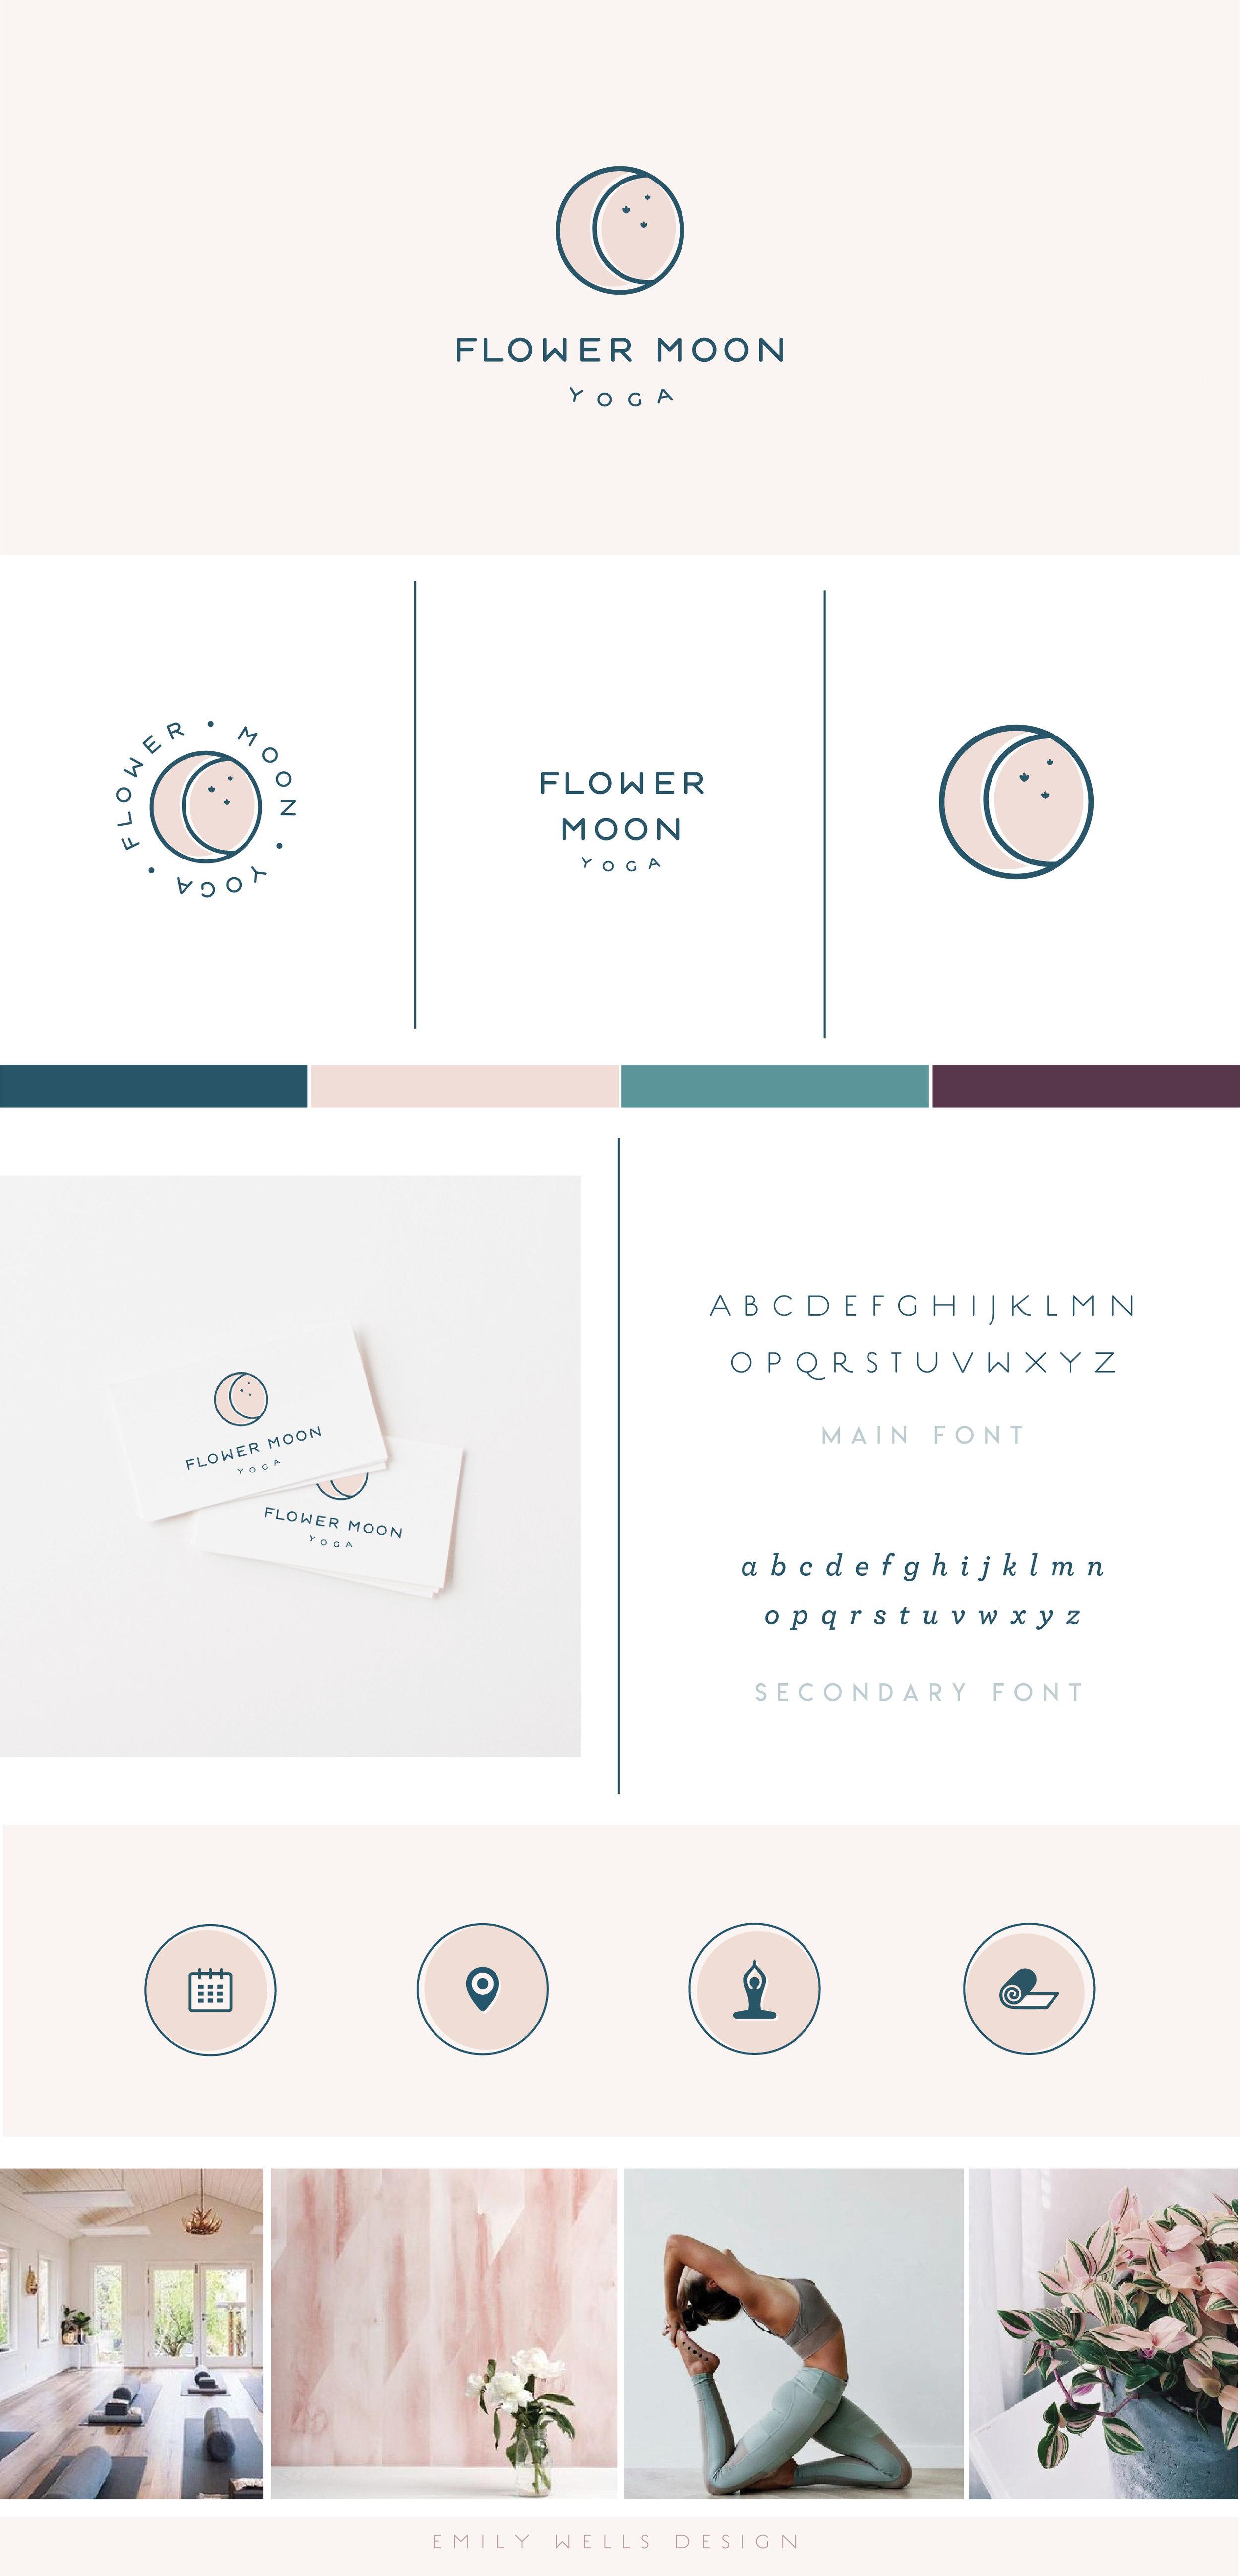 Flower-Moon-Yoga-BrandBoard-RGB-01.jpg